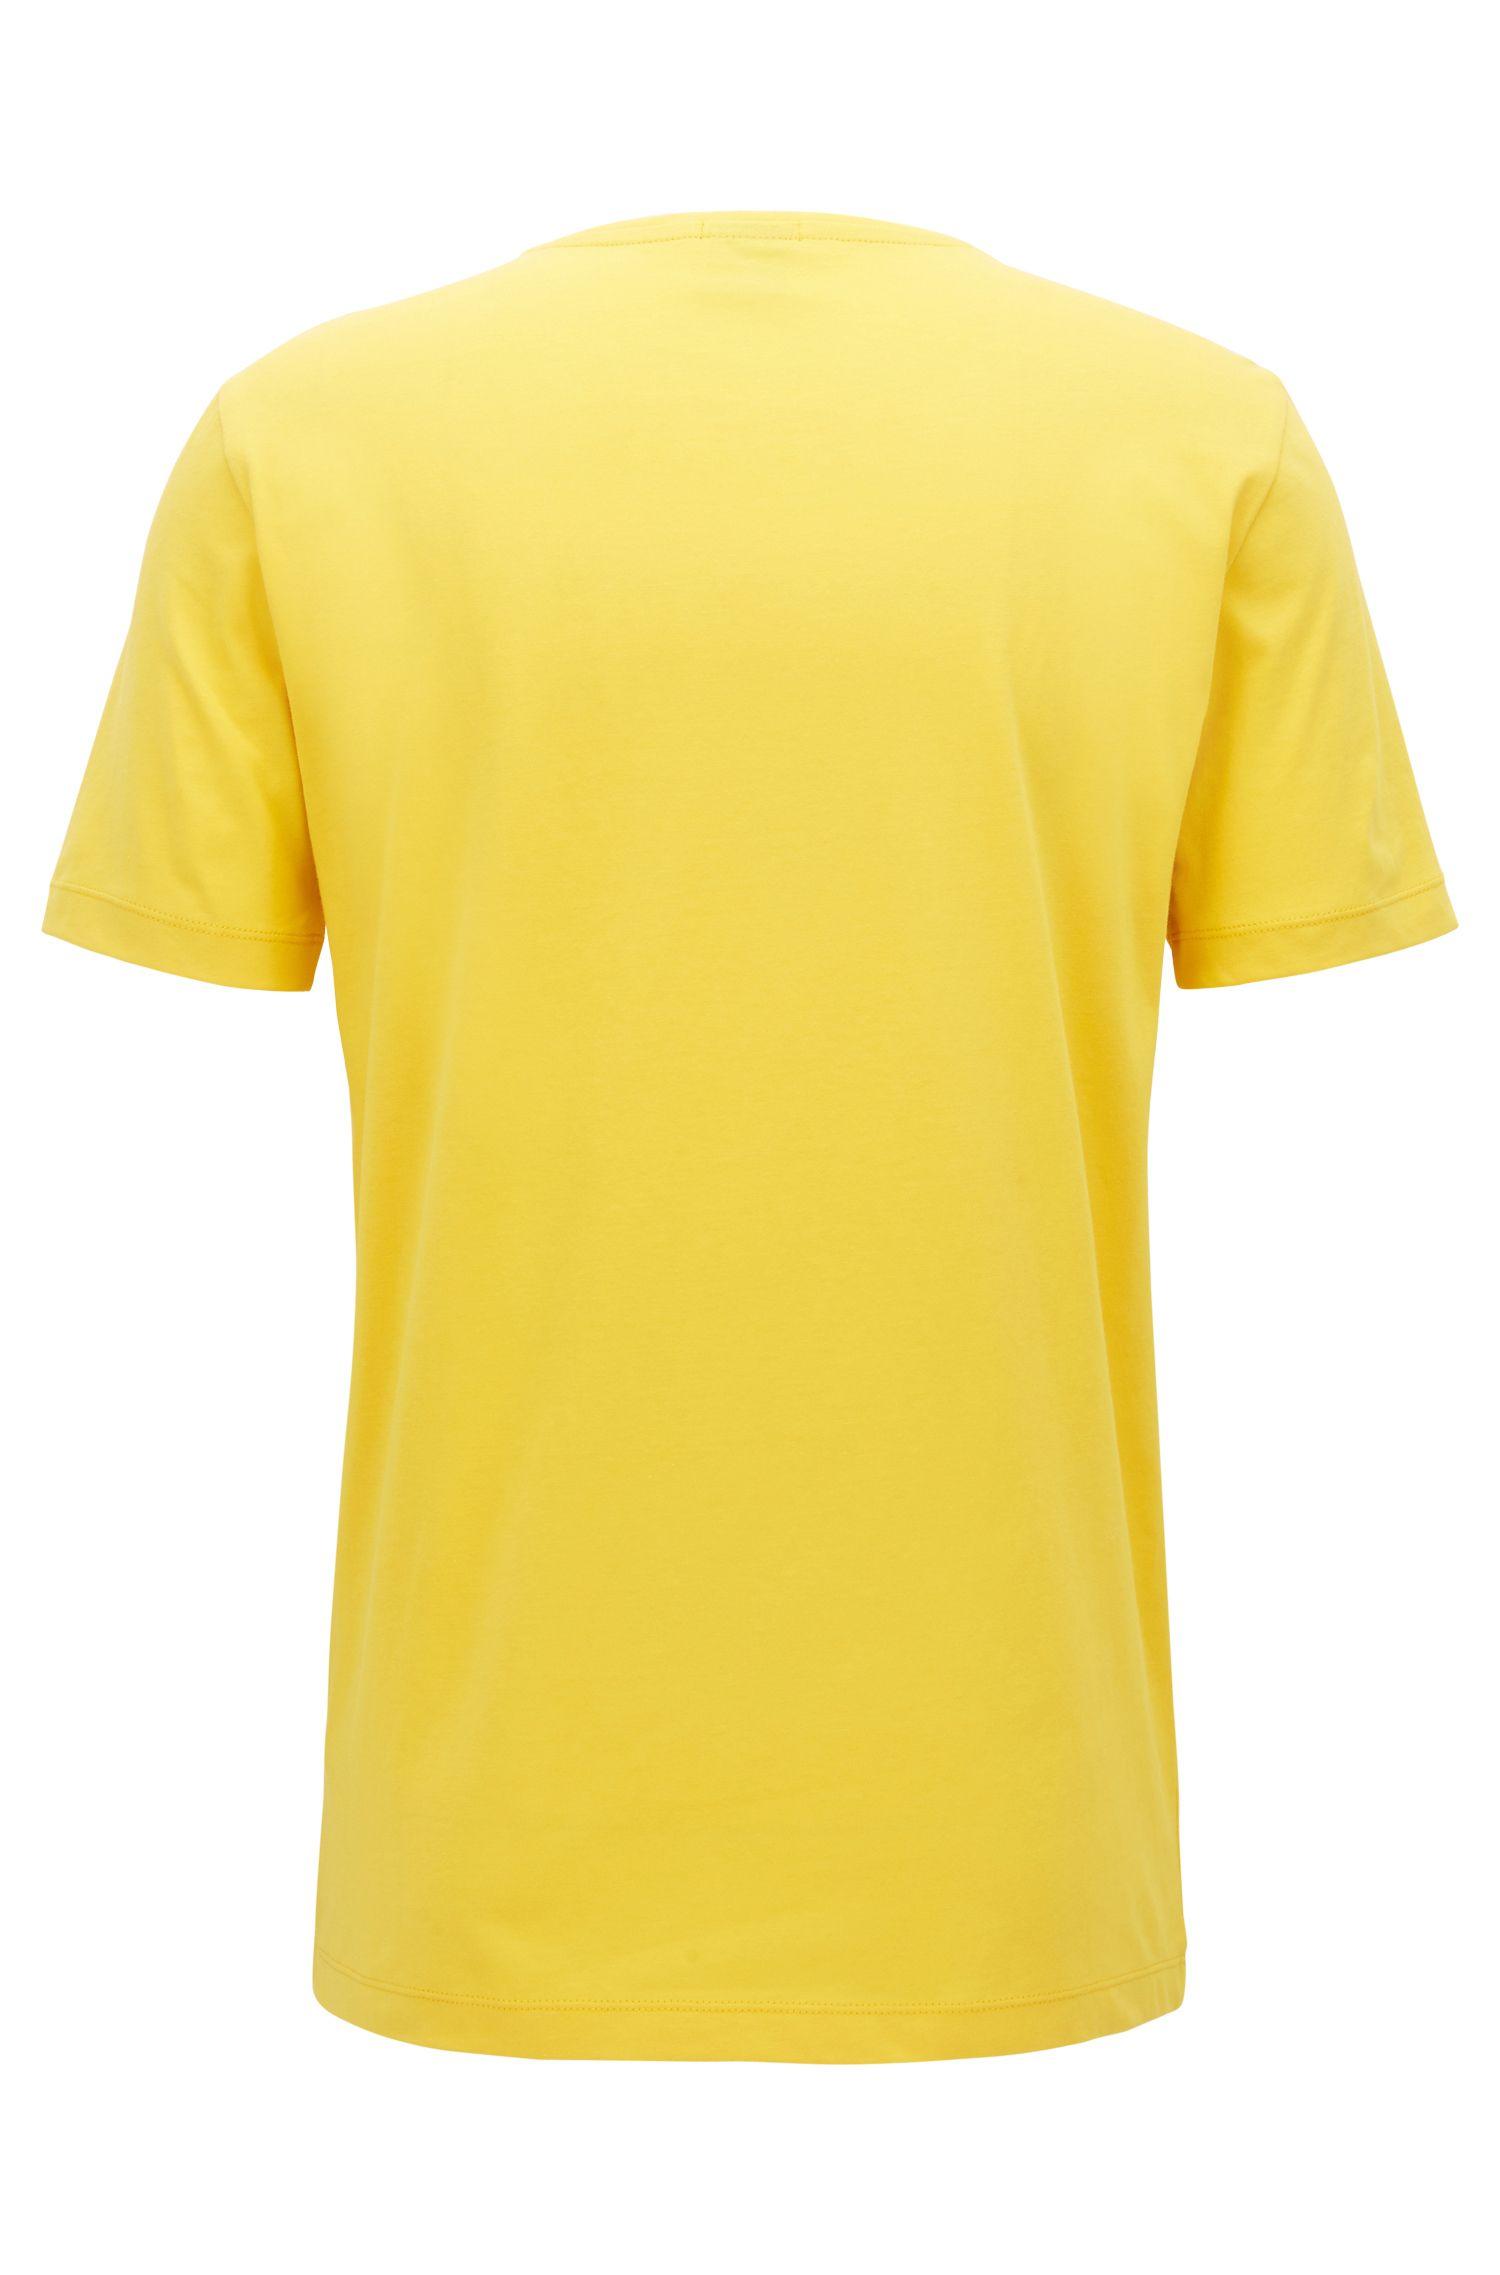 Camiseta de cuello redondo en punto sencillo teñido en hilo